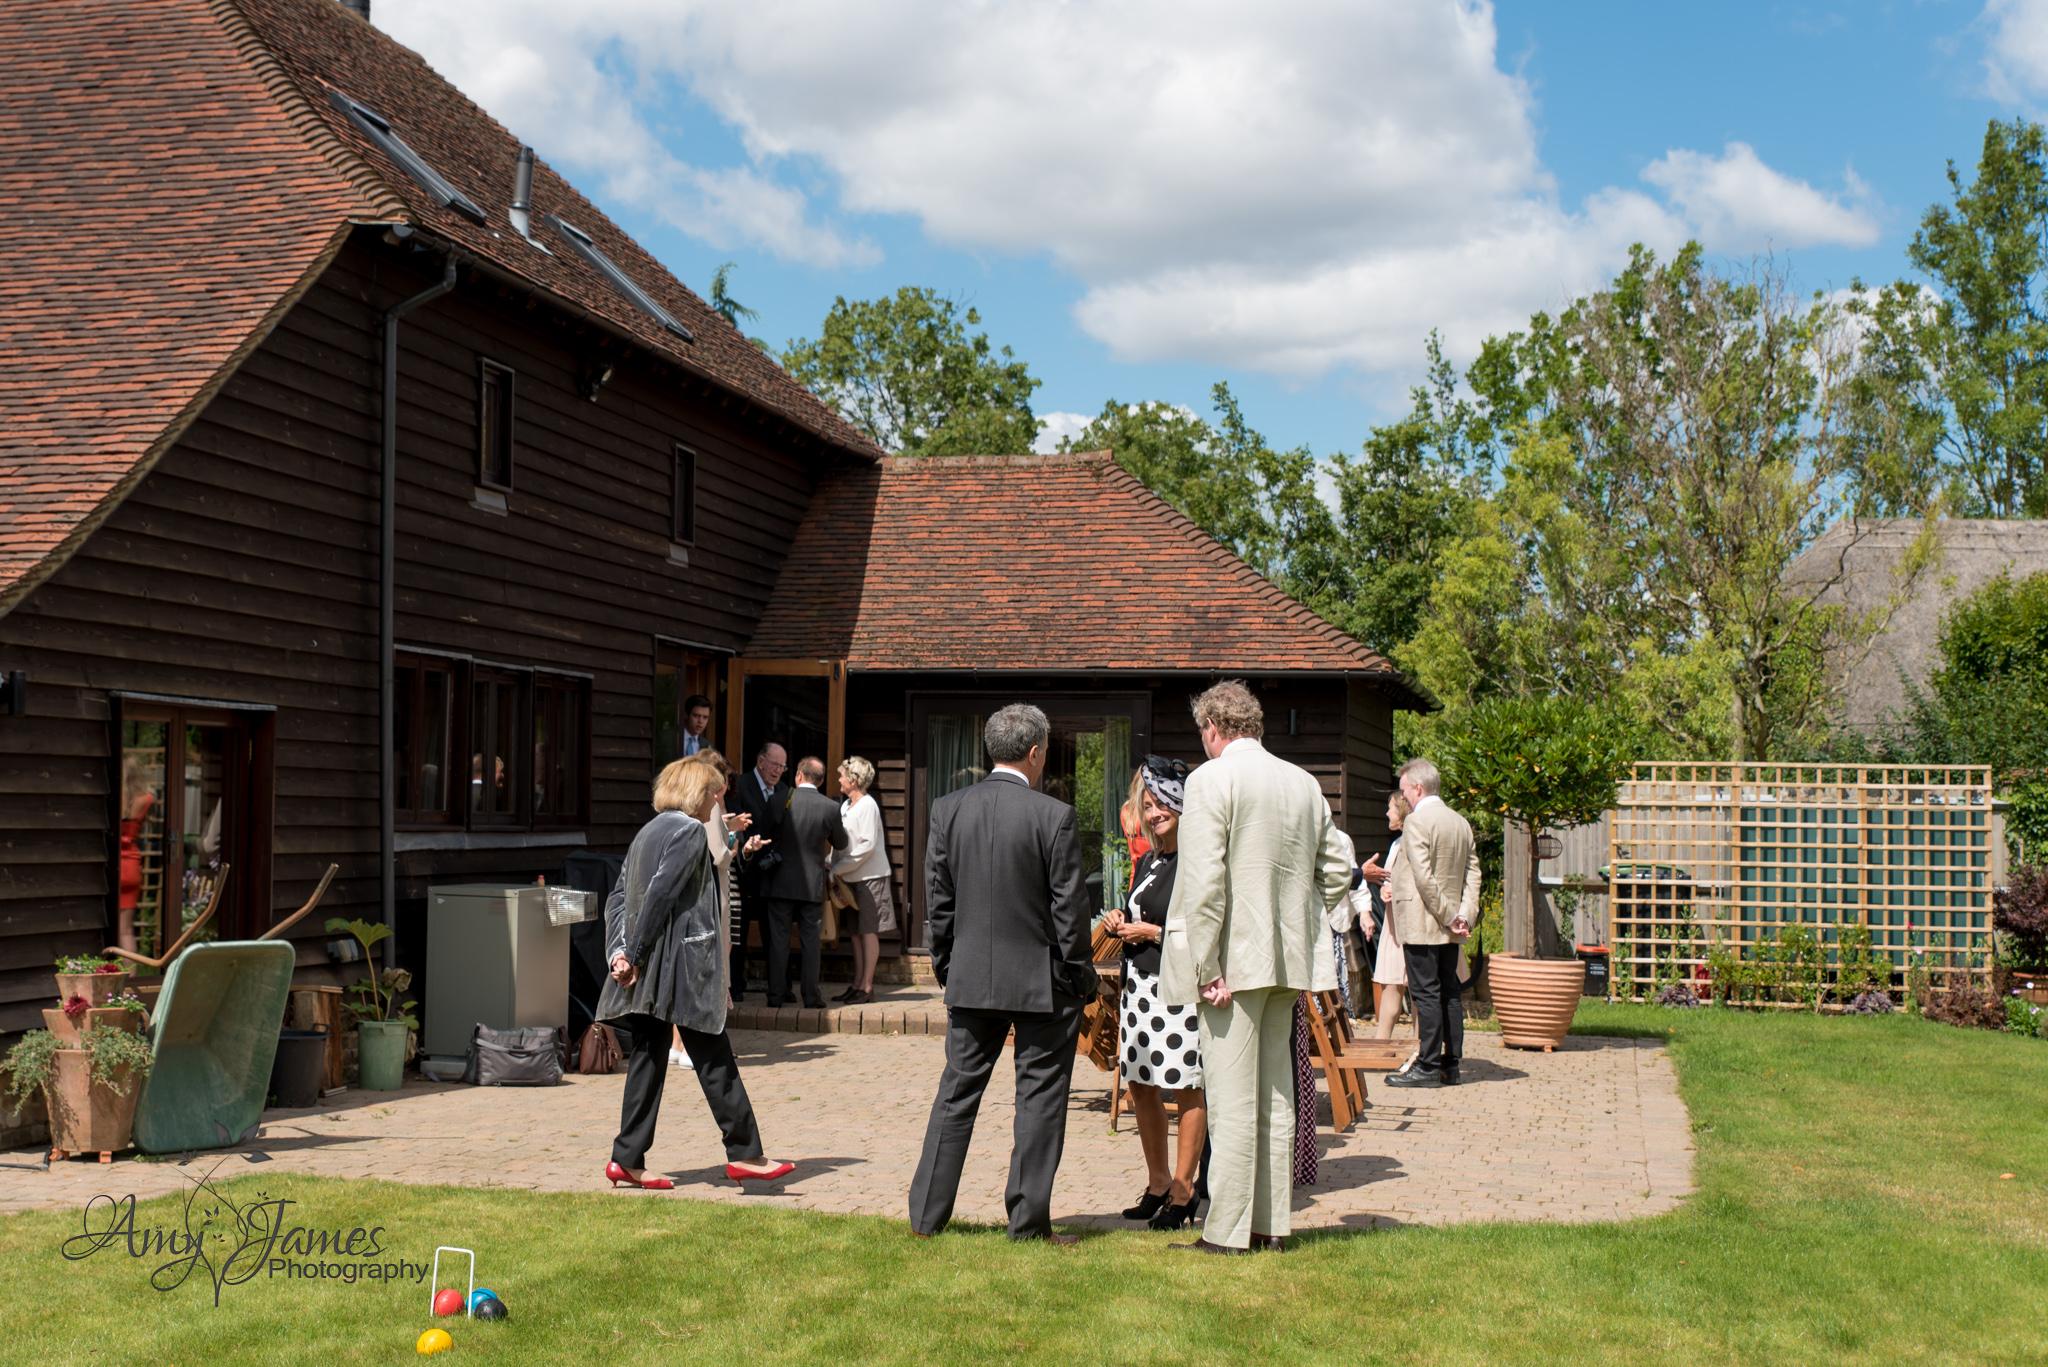 Hampshire wedding photogrpaher // Fleet wedding photographer // Countryside wedding